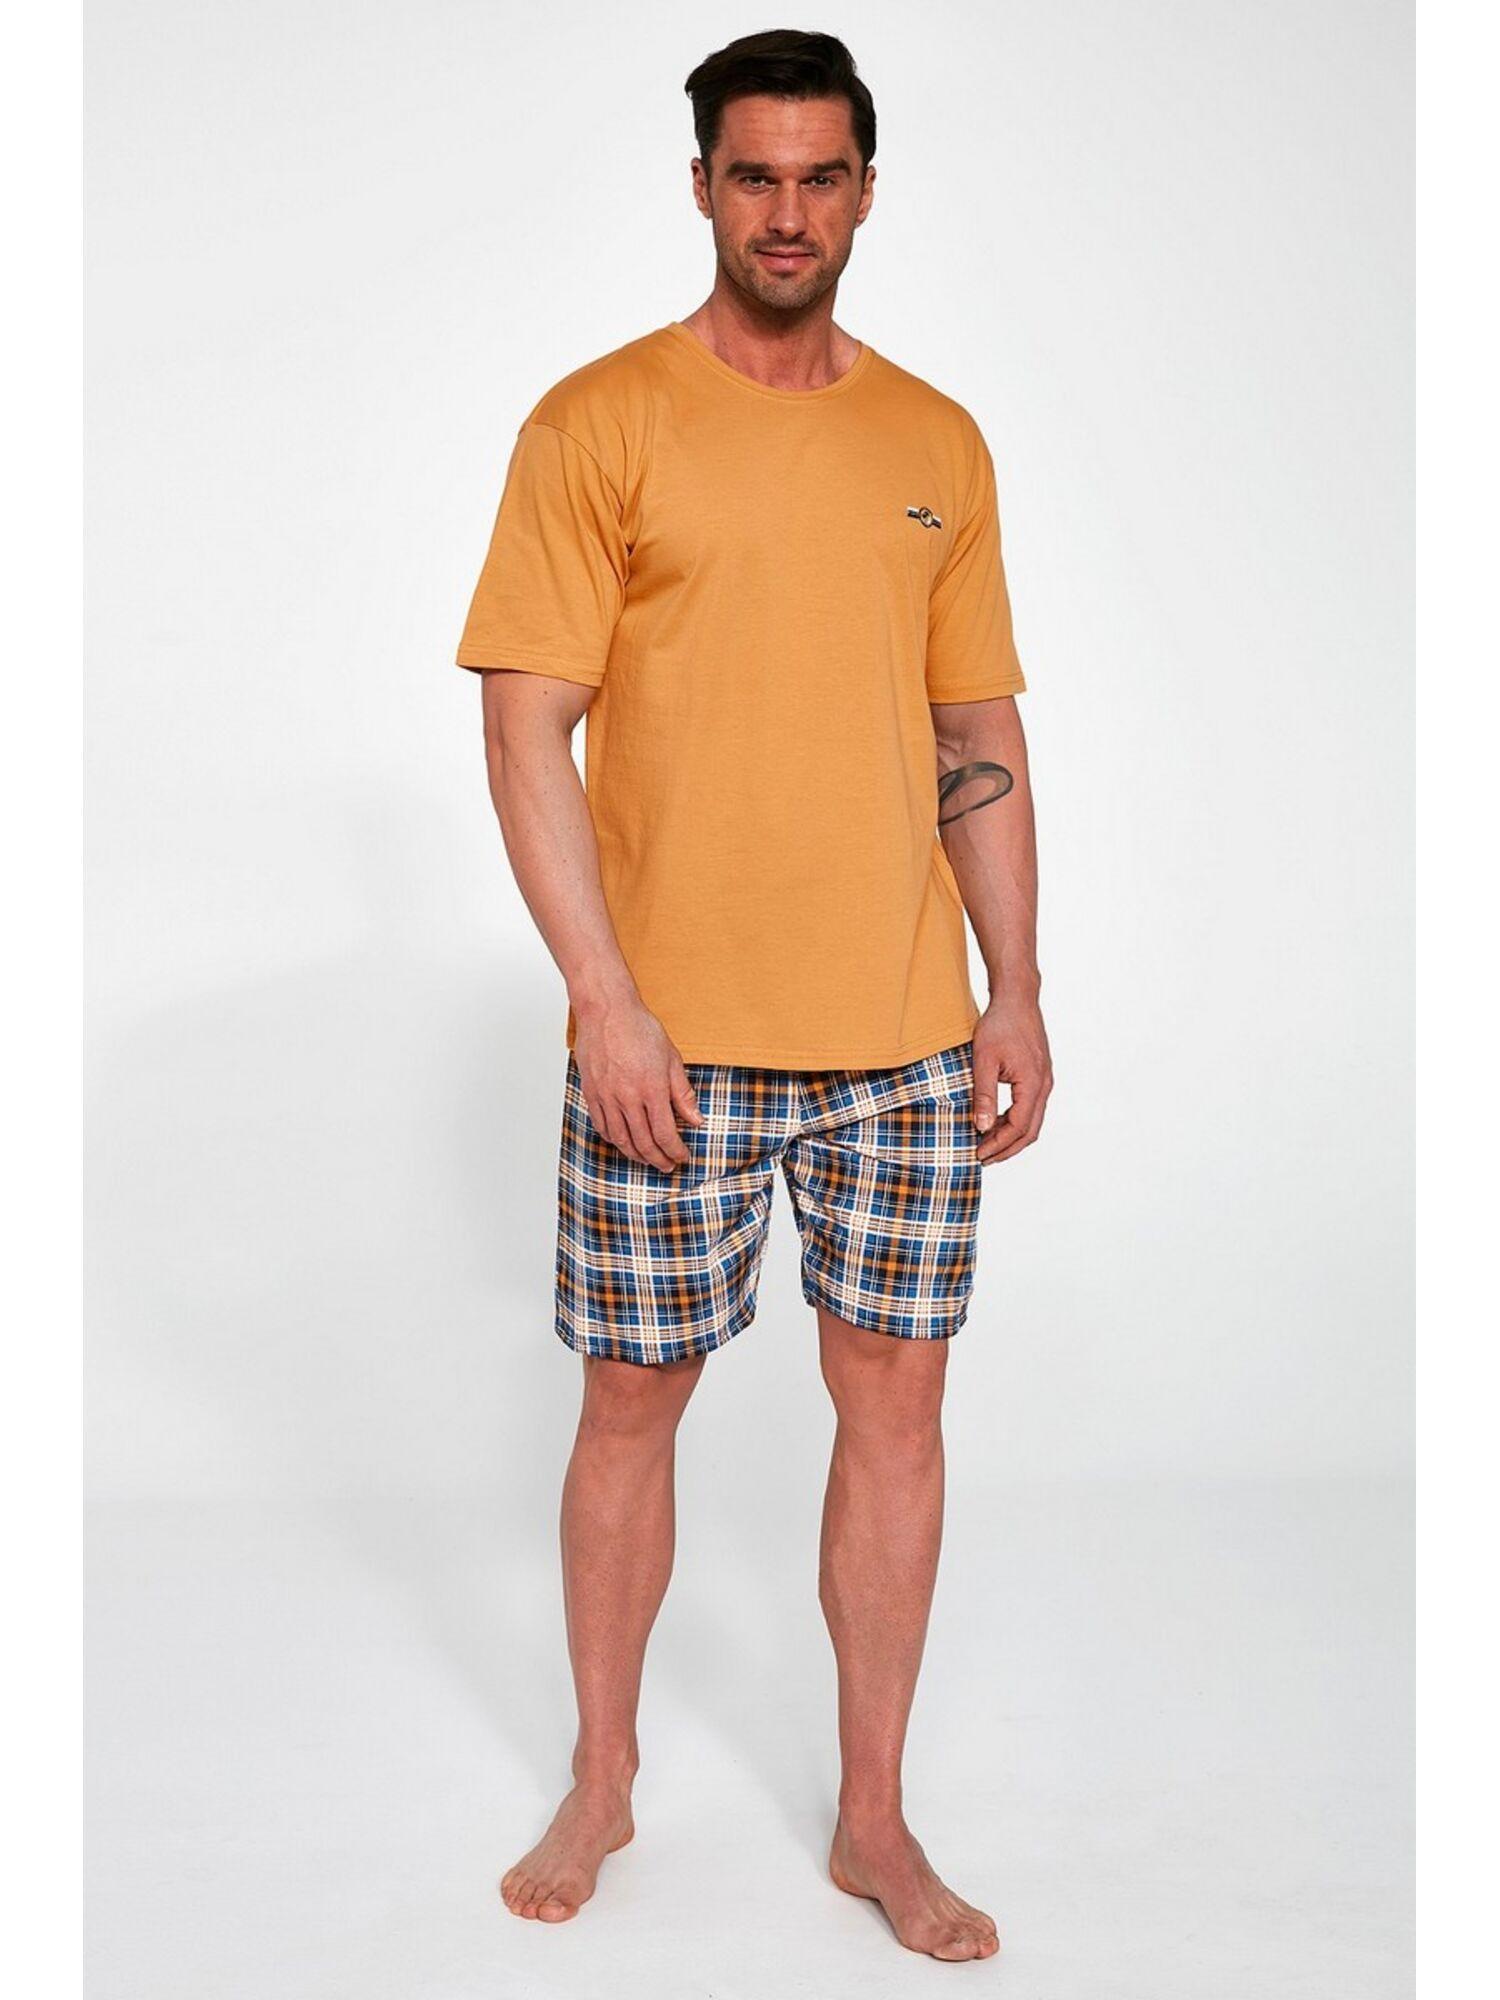 Пижама мужская с шортами 326 MARK, оранжевый, Cornette